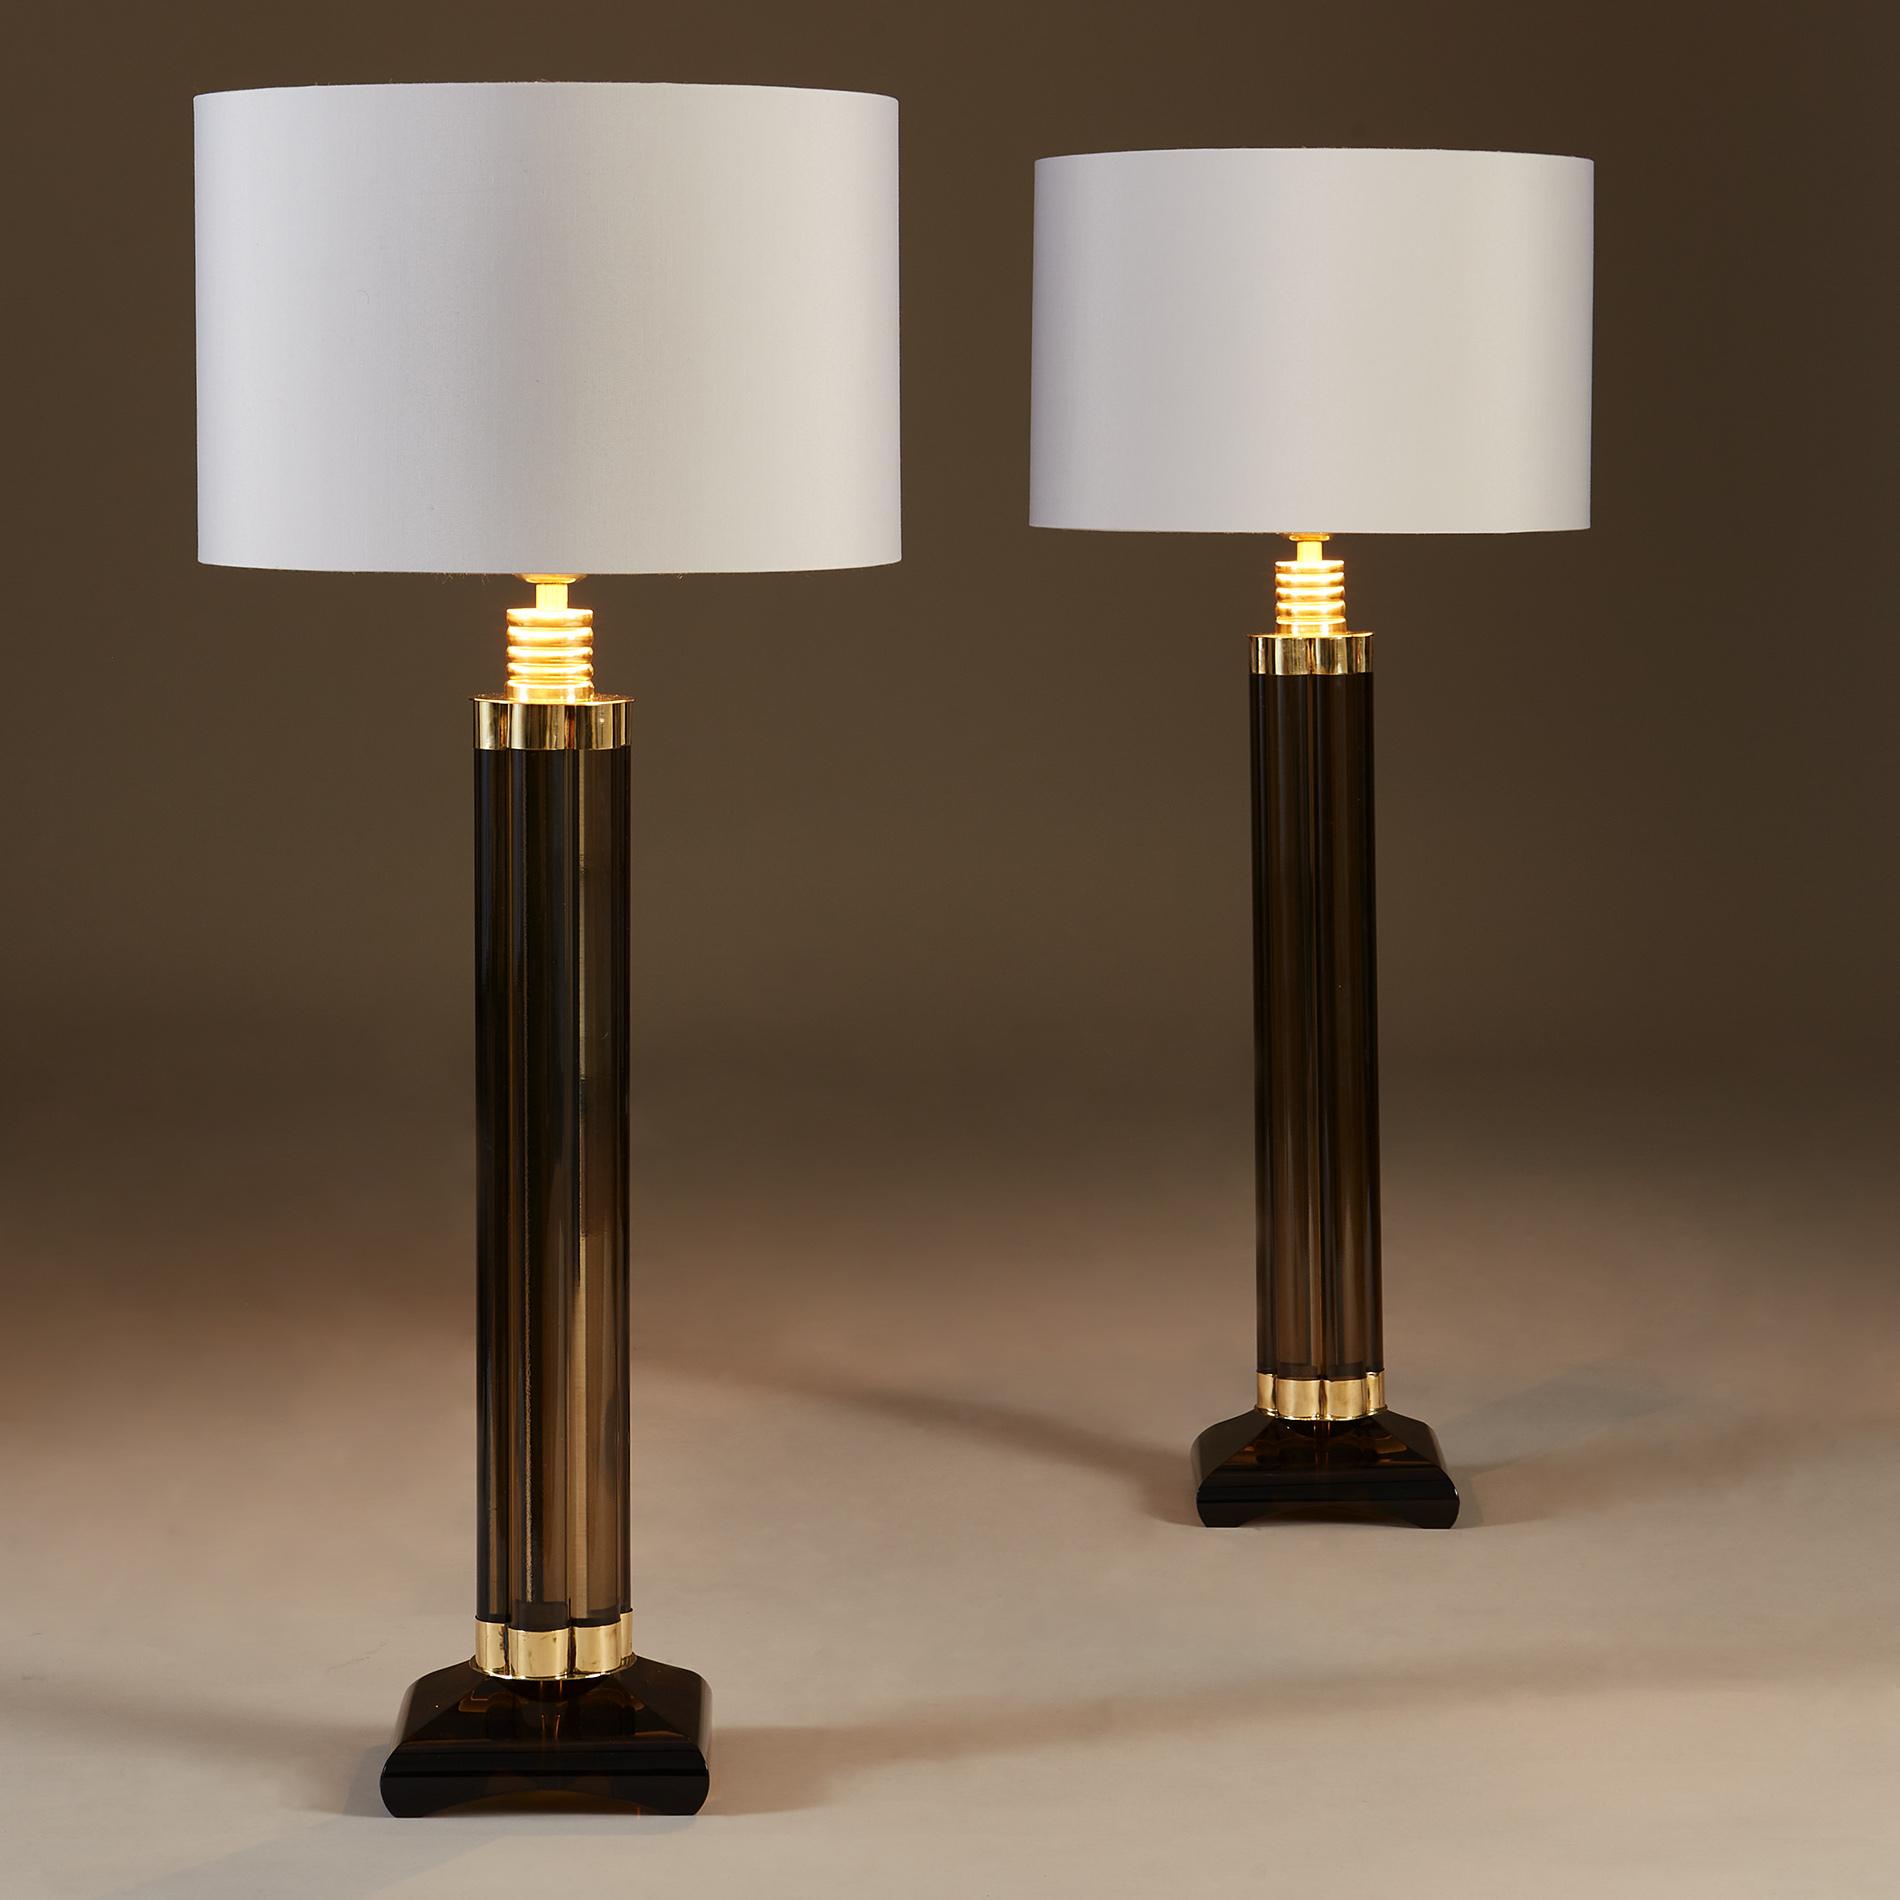 Smokey Crystal Column Lamps 20210225 Valerie Wade 2 187 V1